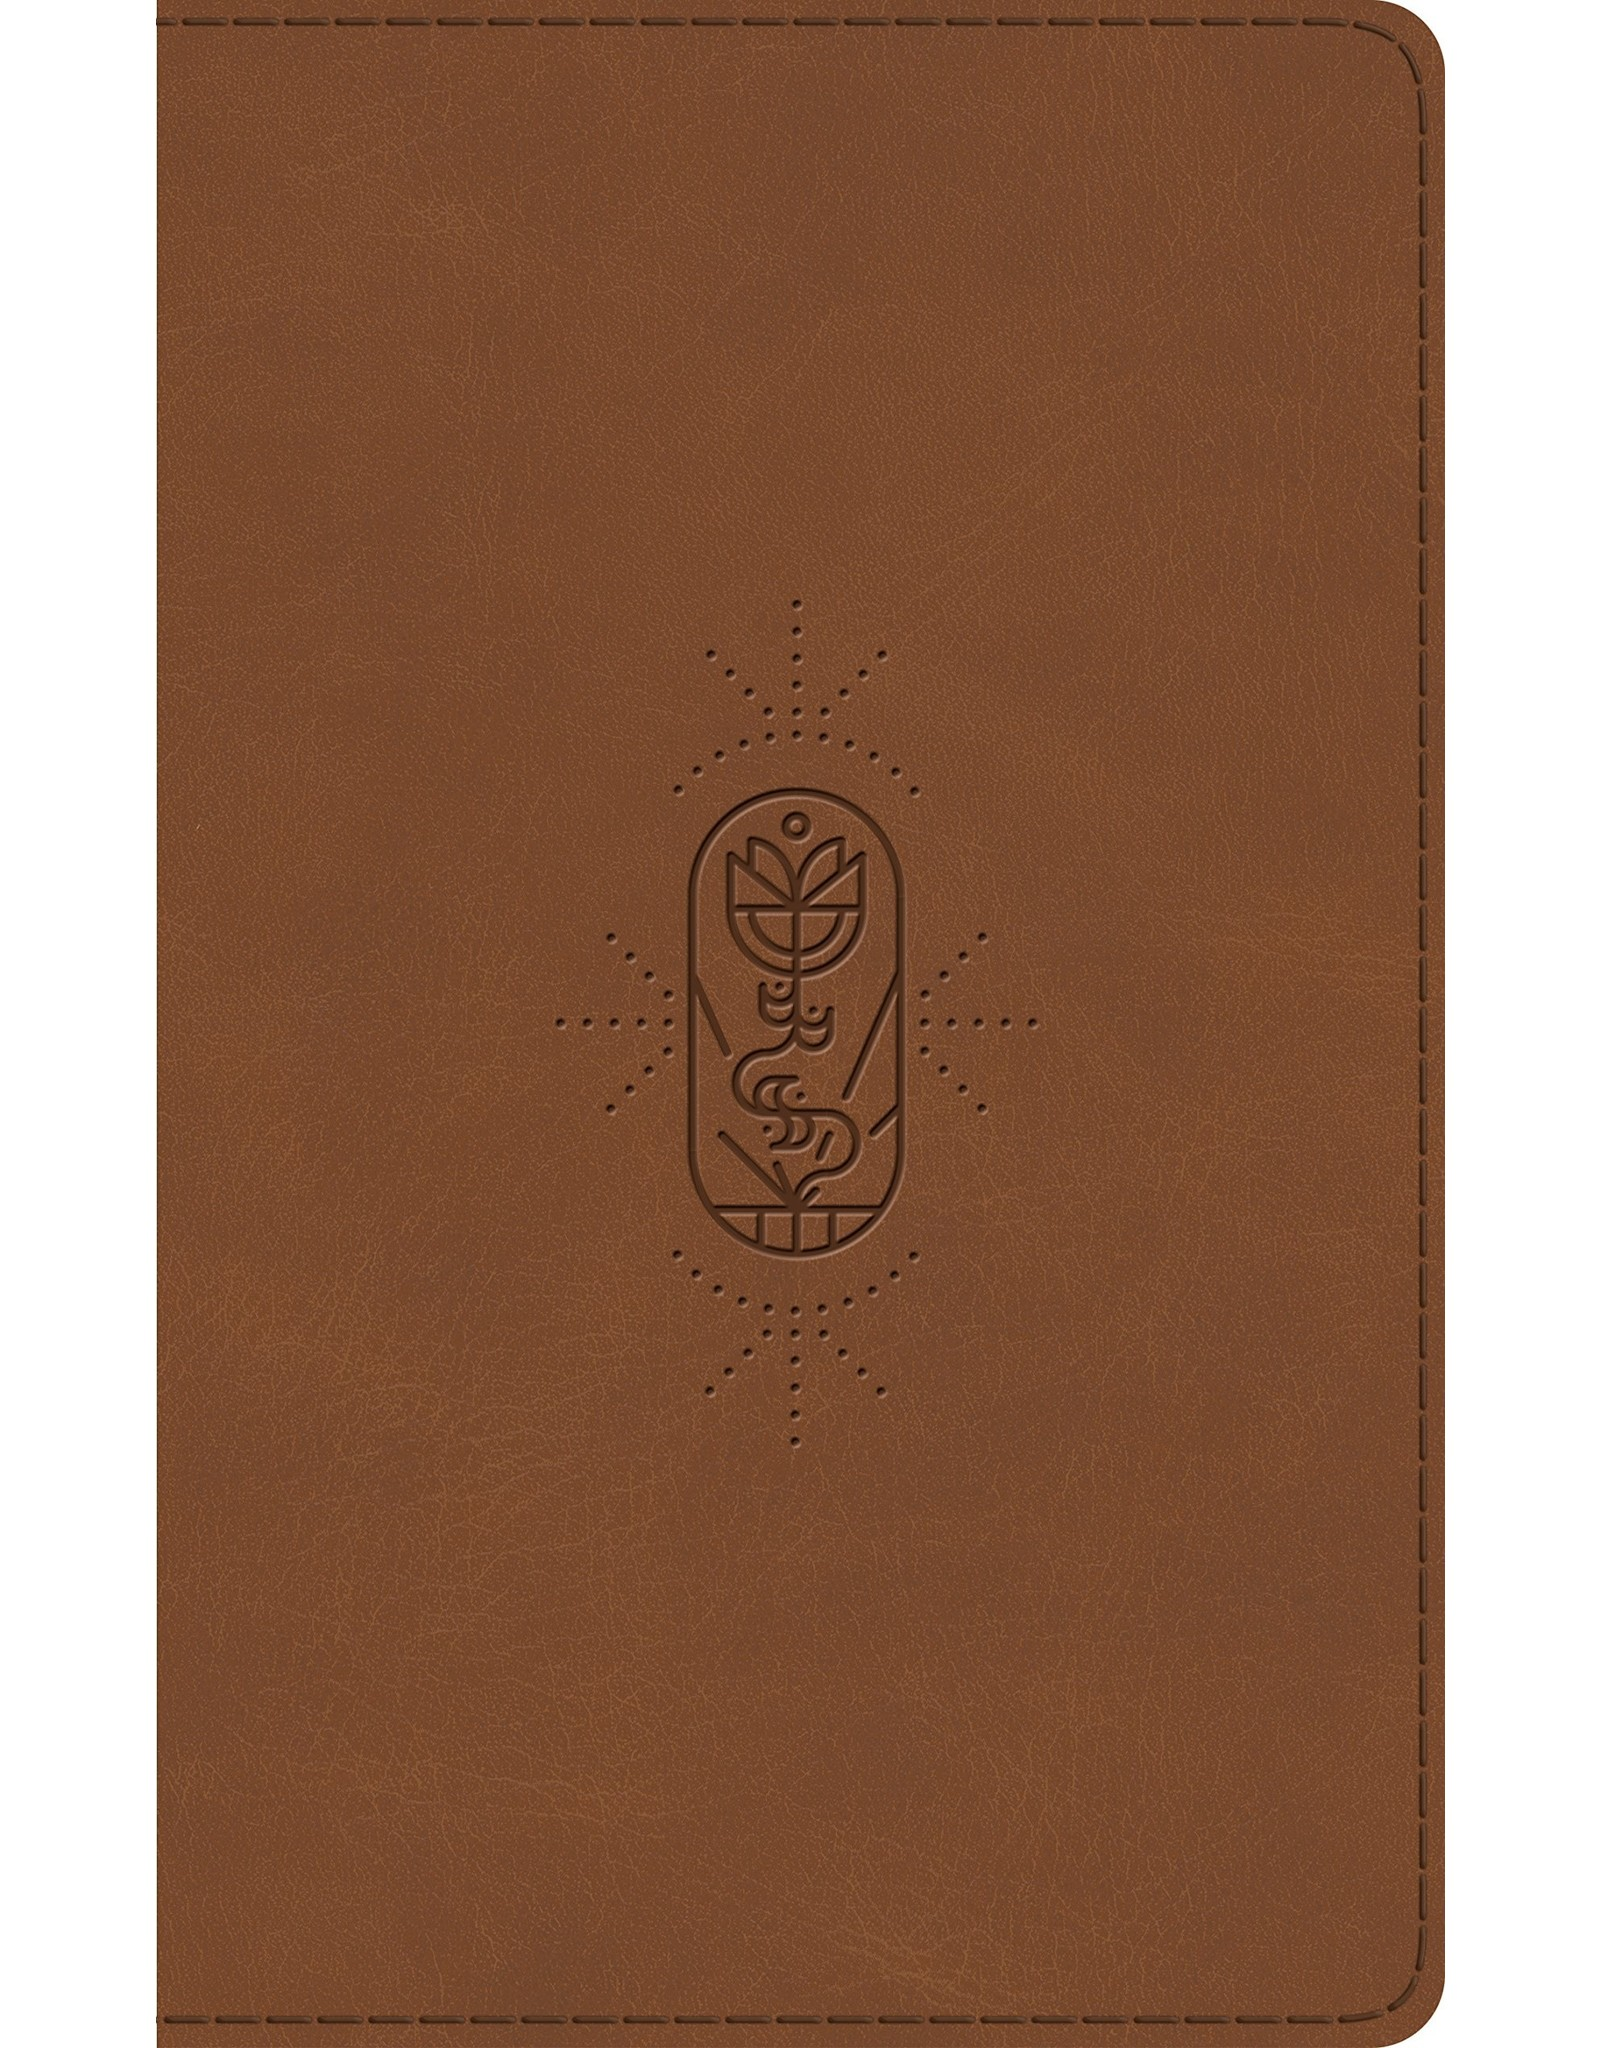 Crossway / Good News ESV Kid's Thinline Bible - Brown The True Vine Design TruTone